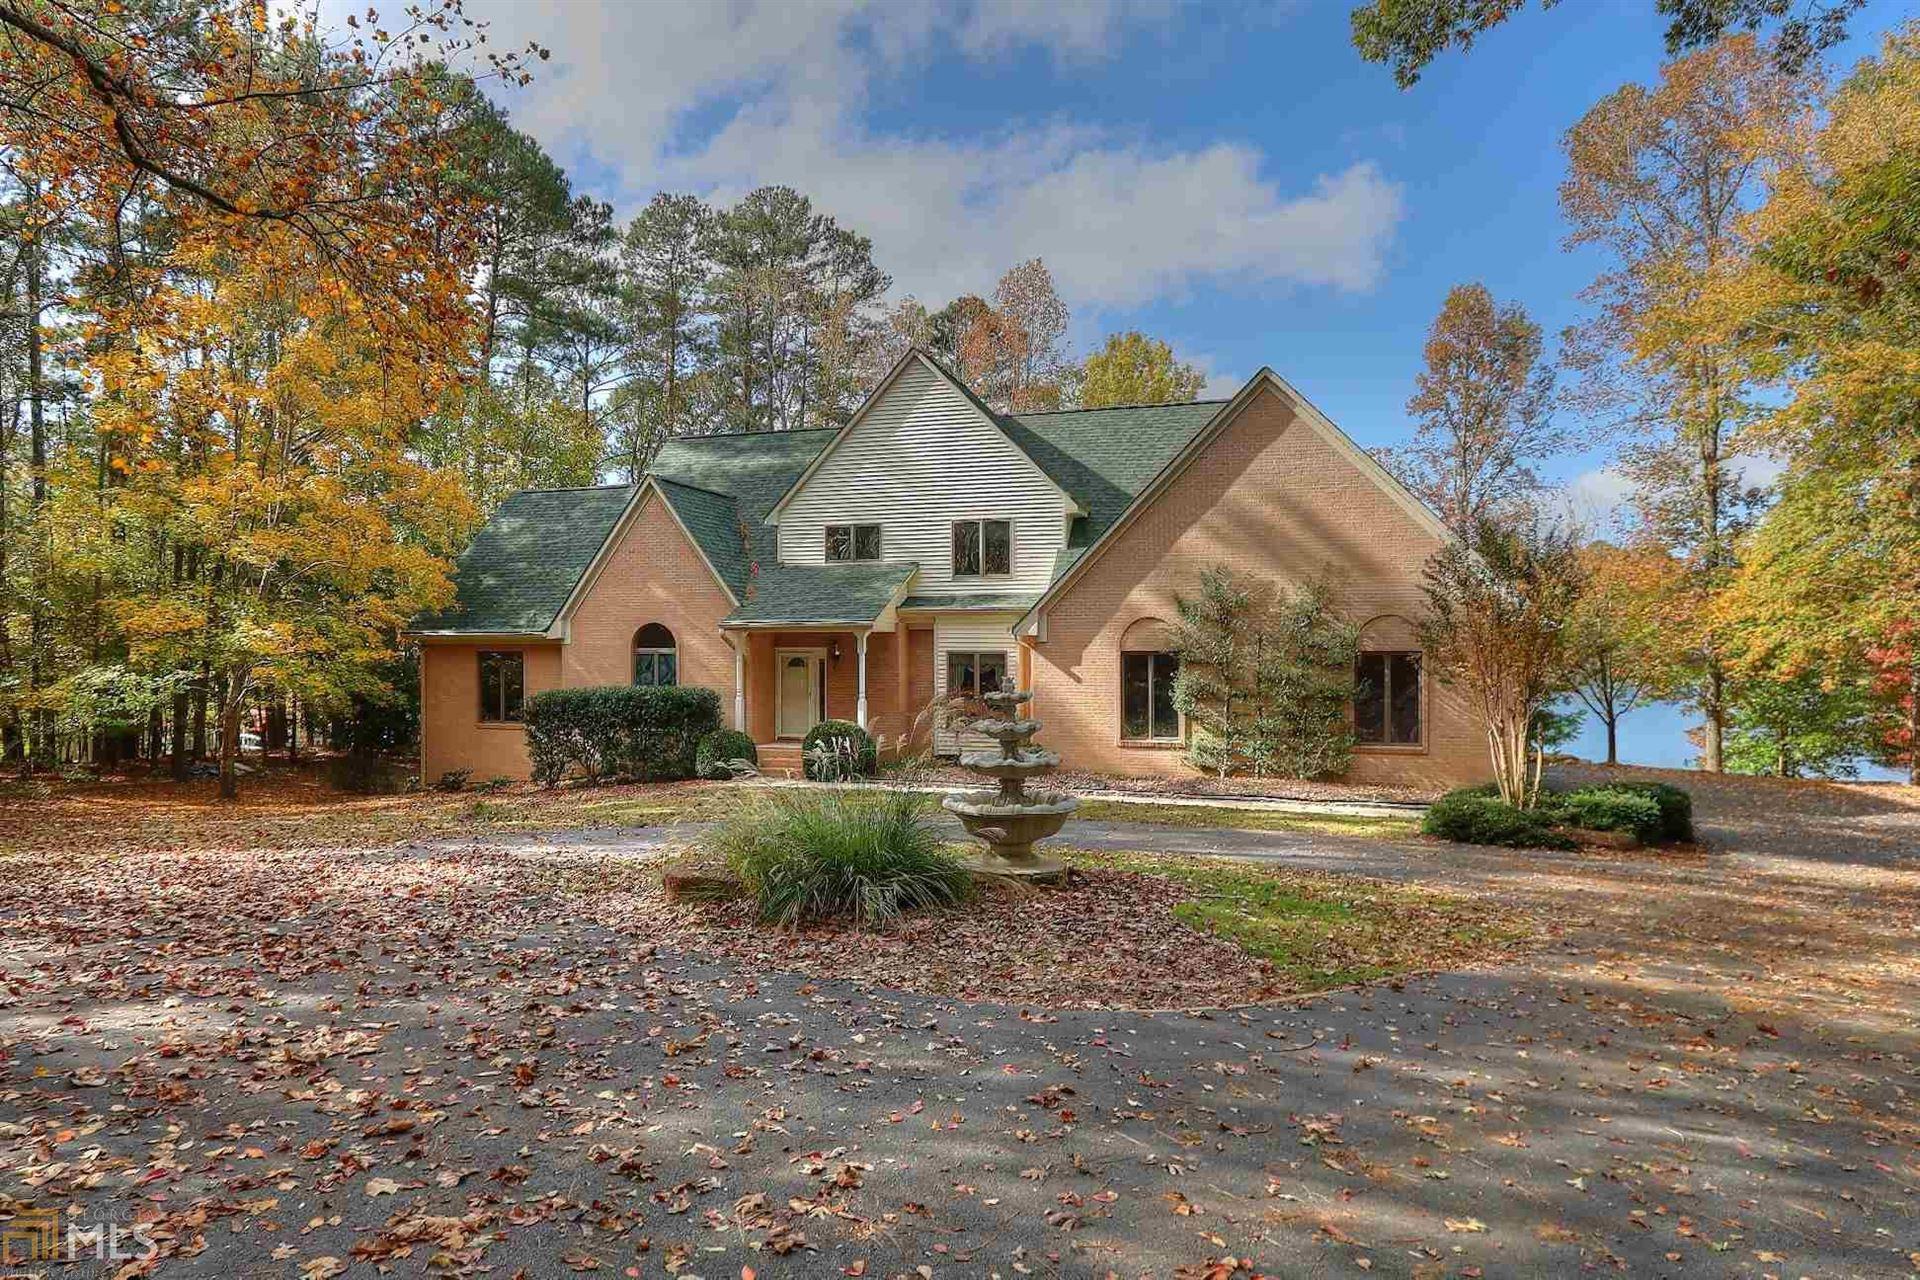 1020 Greyfield Rd, Greensboro, GA 30642 - MLS#: 8887781